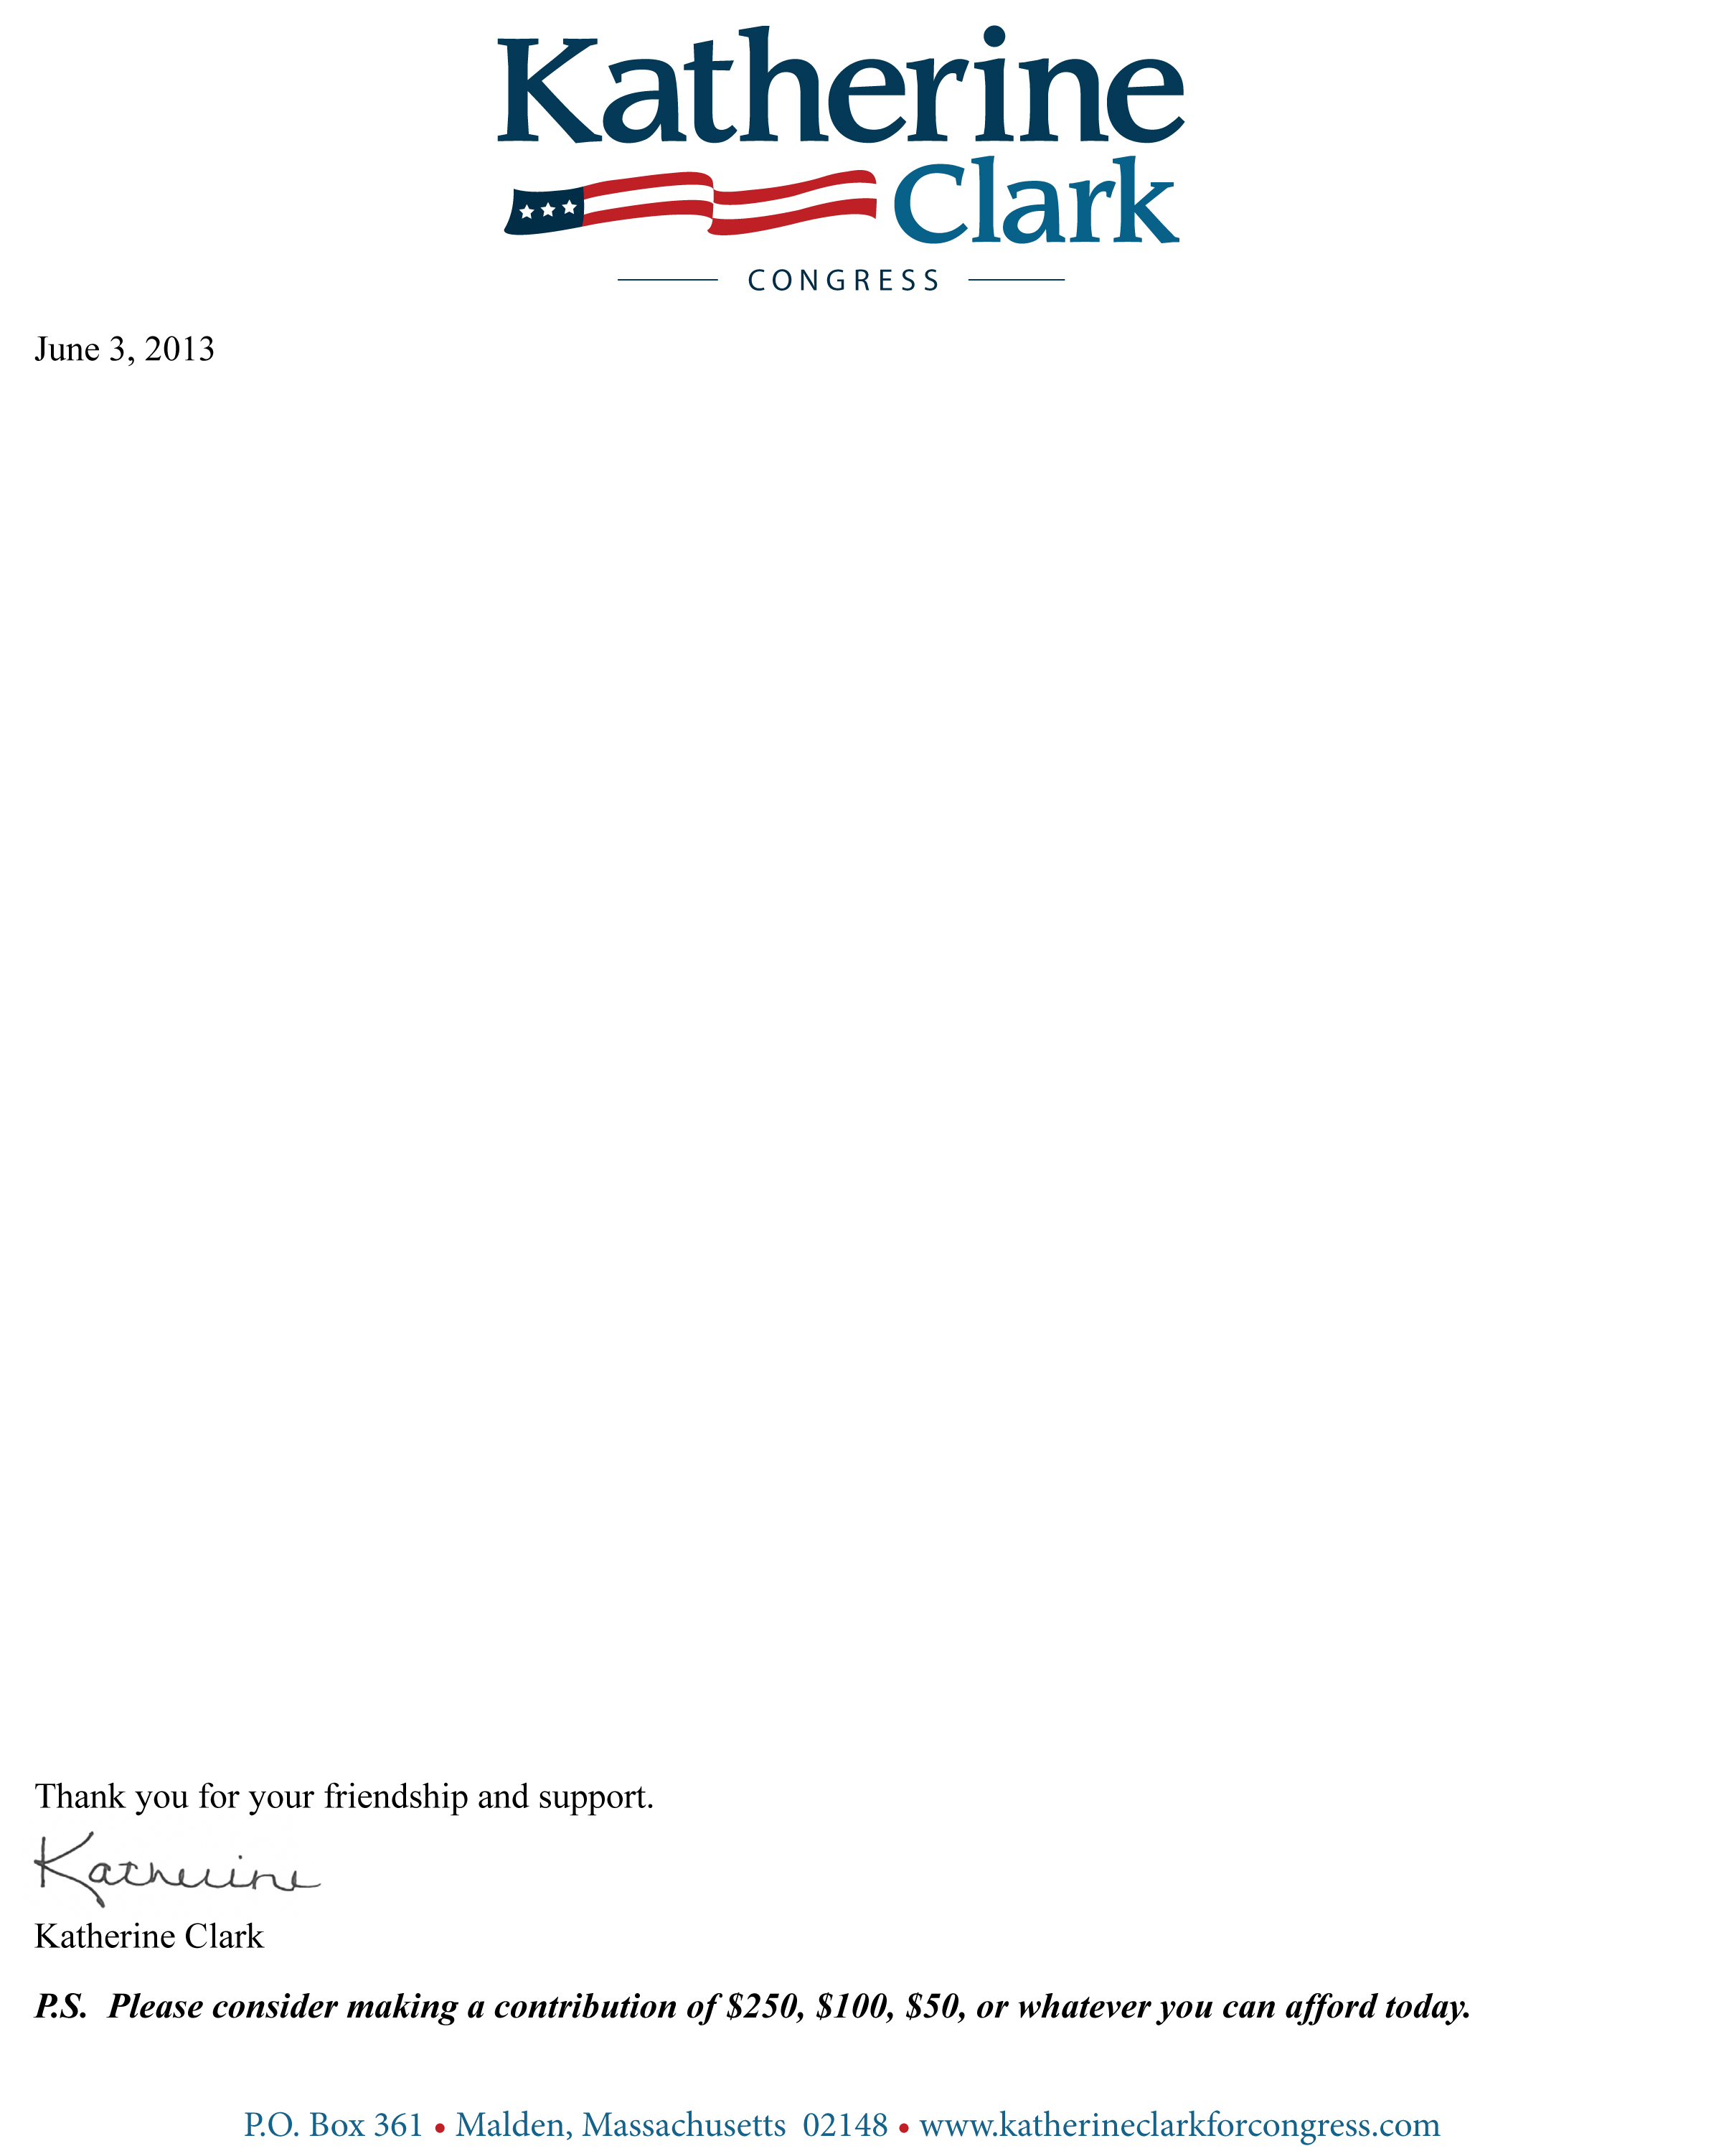 Mailing 2 Letter